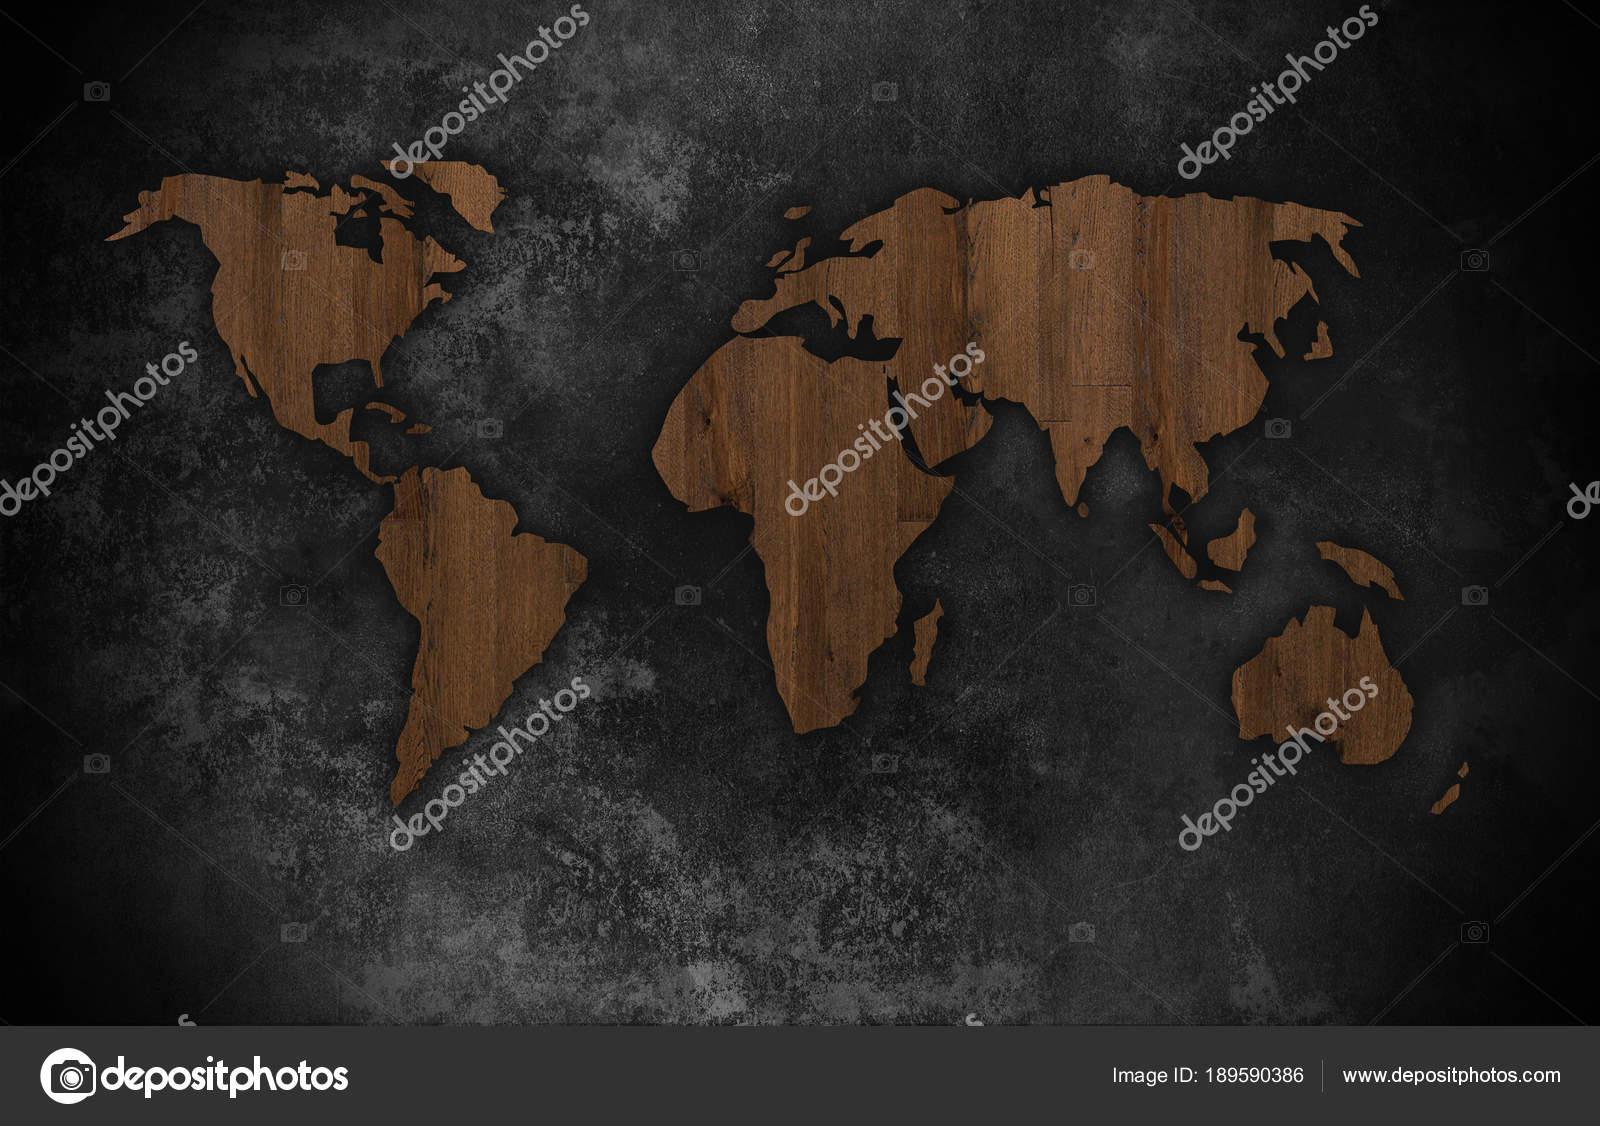 Silhouette World Map Dark Background Art — Stock Photo